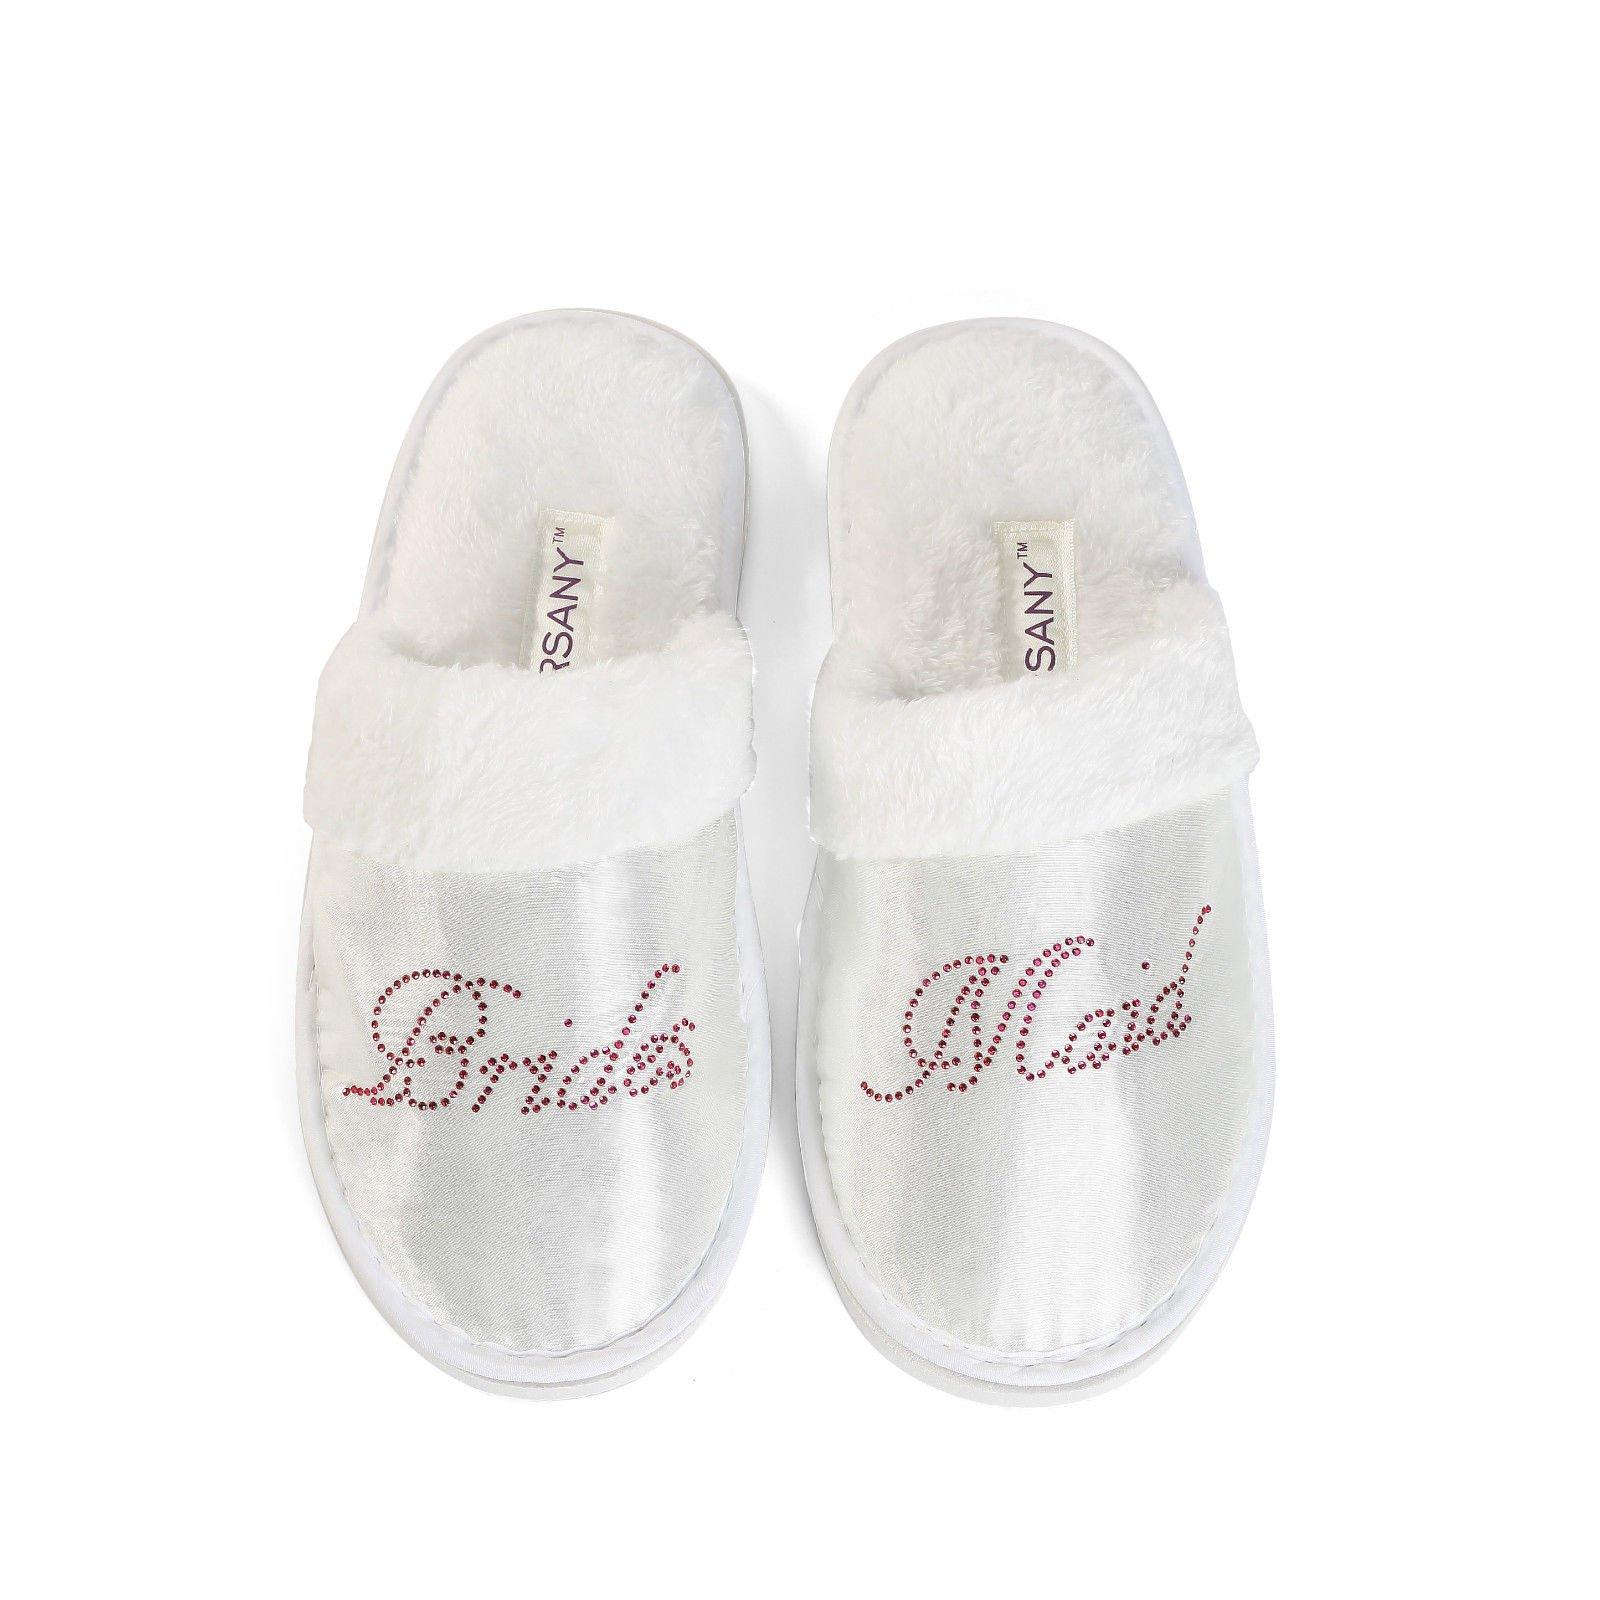 Hot Pink Bridesmaid Spa Slippers Hen party Wedding Diamante rhinestone crystal hotel slippers